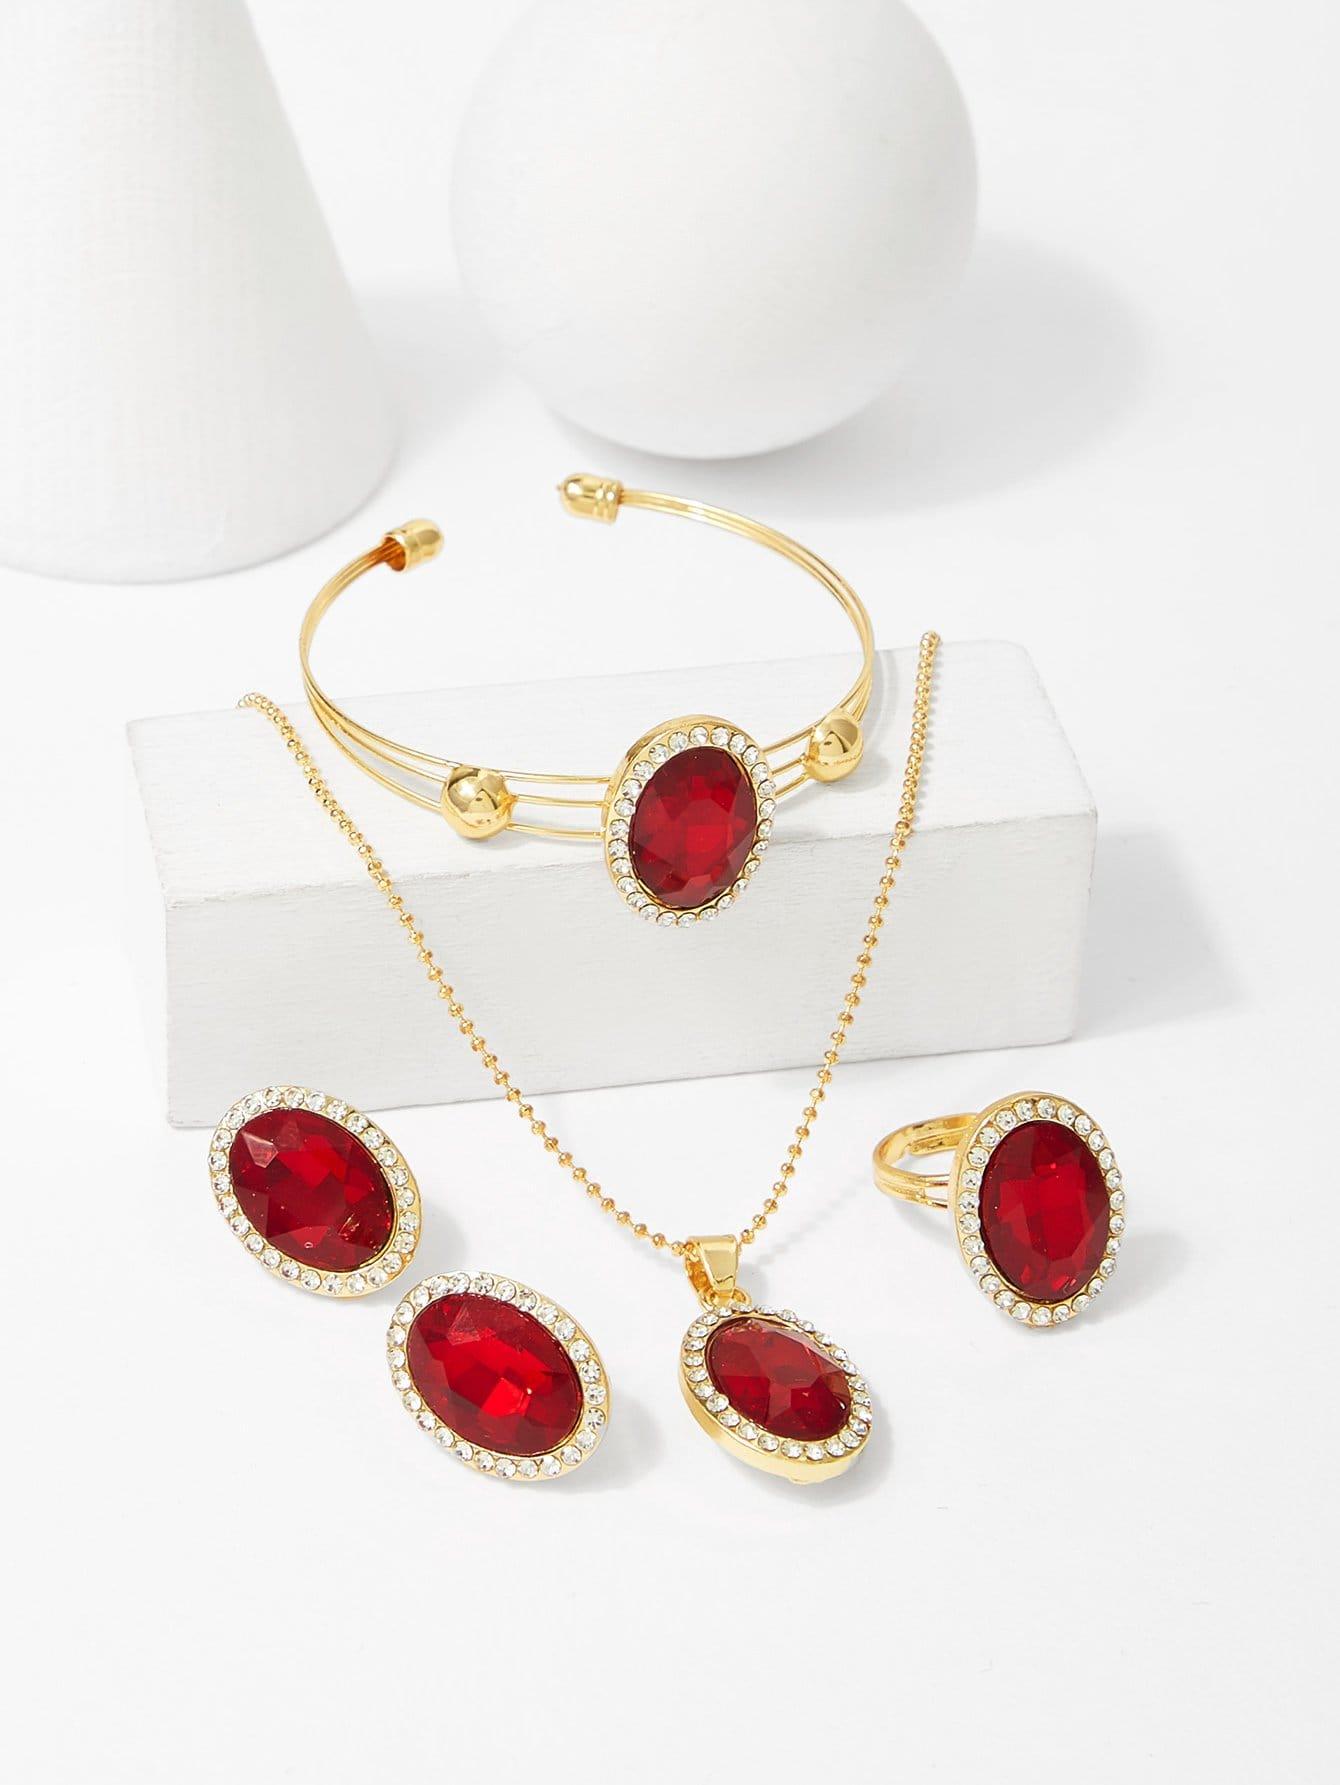 Gemstone Pendant Necklace & Earrings & Bracelet & Ring